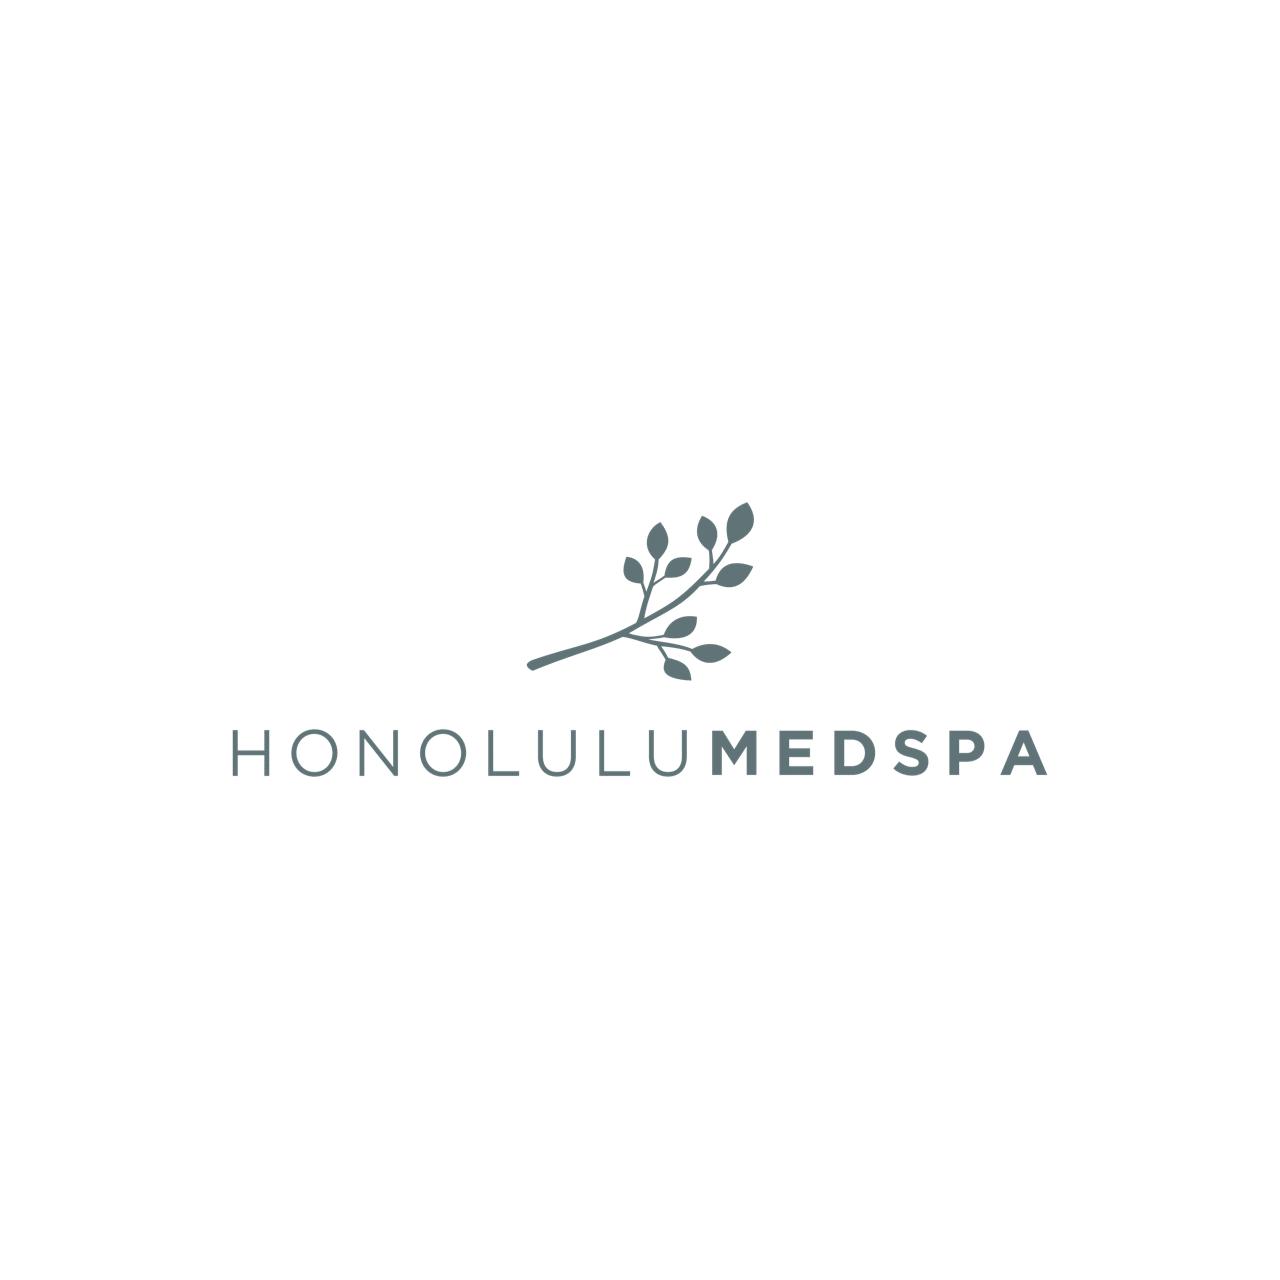 Honolulu MedSpa